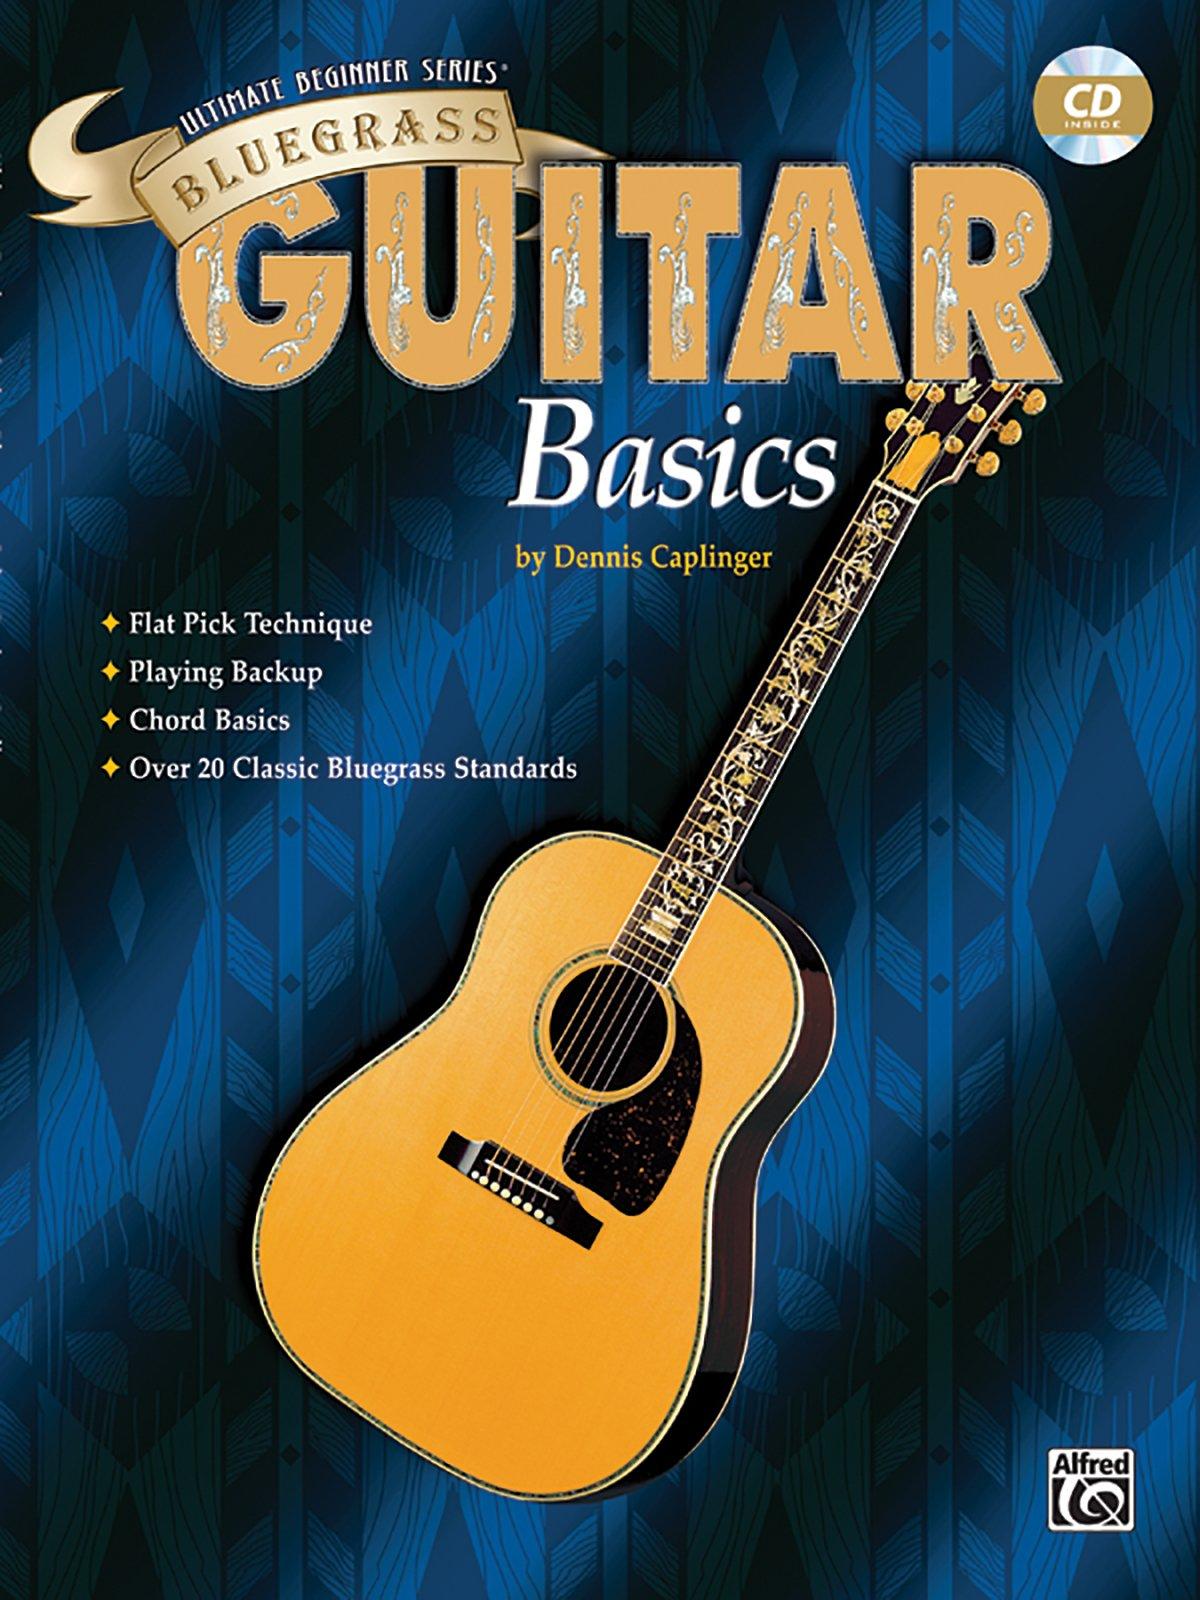 Download Ultimate Beginner Bluegrass Guitar Basics: Book & CD (The Ultimate Beginner Series) pdf